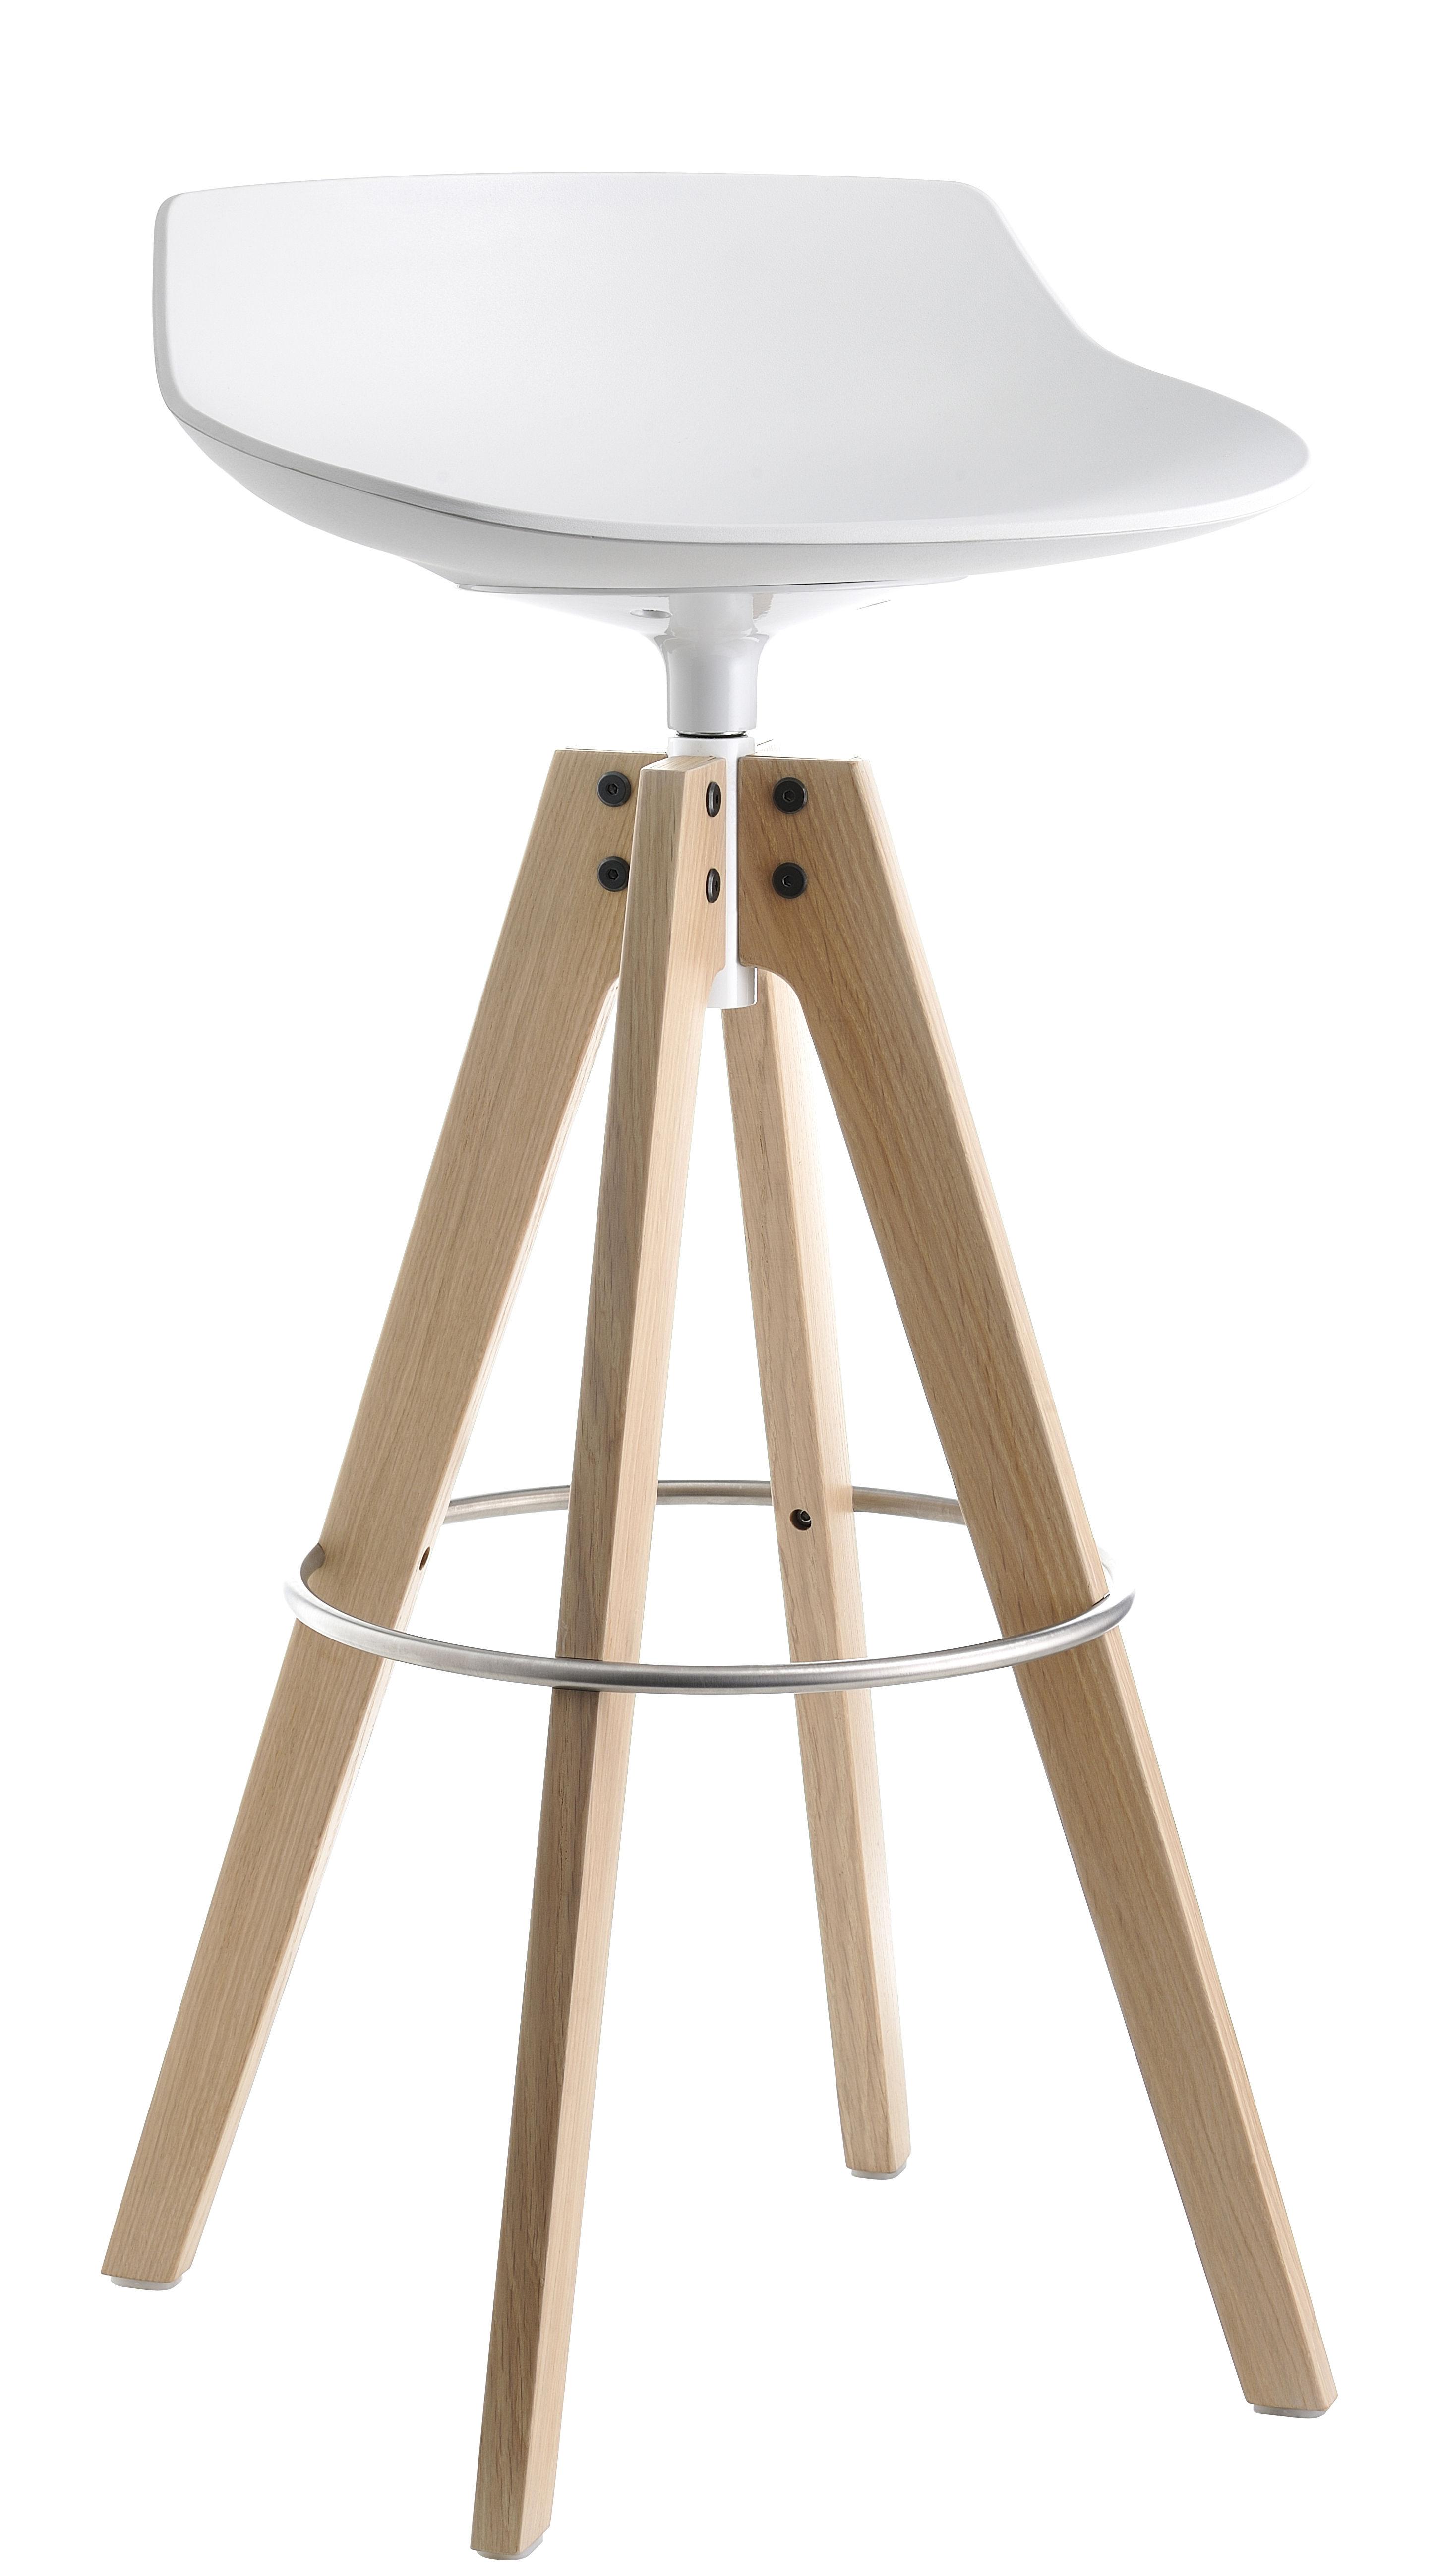 Furniture - Bar Stools - Flow Bar stool - H 78 cm - Oak legs by MDF Italia - White / Natural oak legs - Brushed stainless steel, Polyurethane, Solid oak